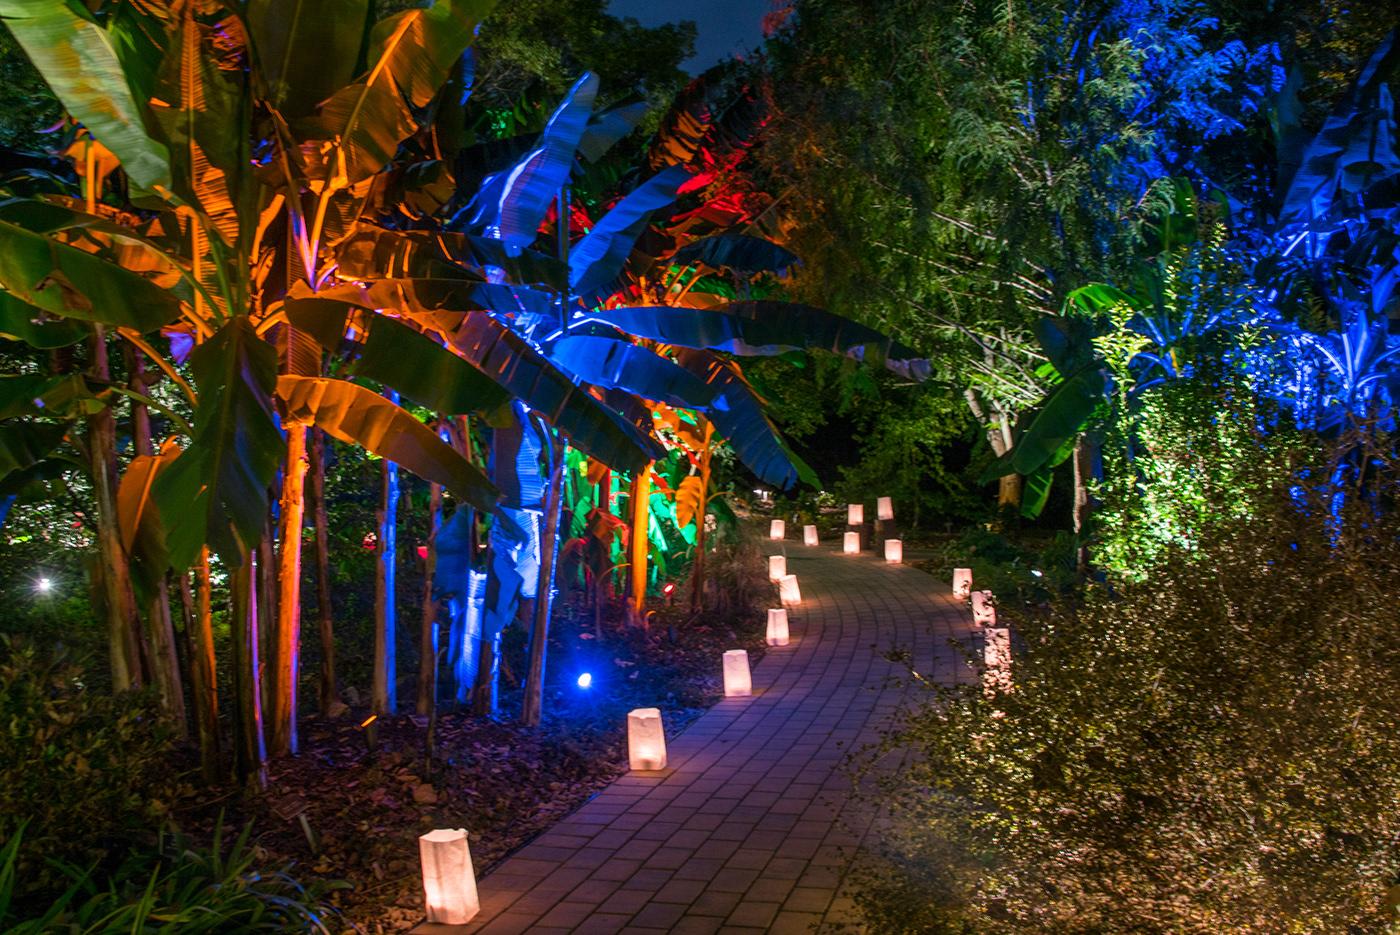 Moonlight In Garden JC Raulston Arboretum ncsu arboretum Botanical garden lighting exhibition landscape lighting music Food  Entertainment